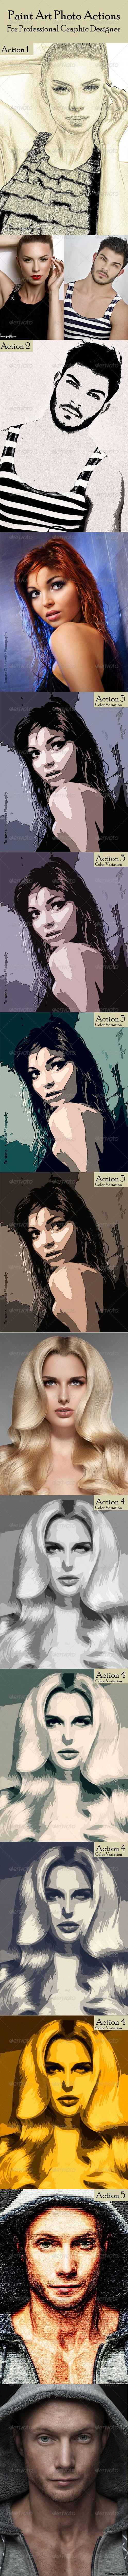 GraphicRiver Paint Art Photo Actions 8187630